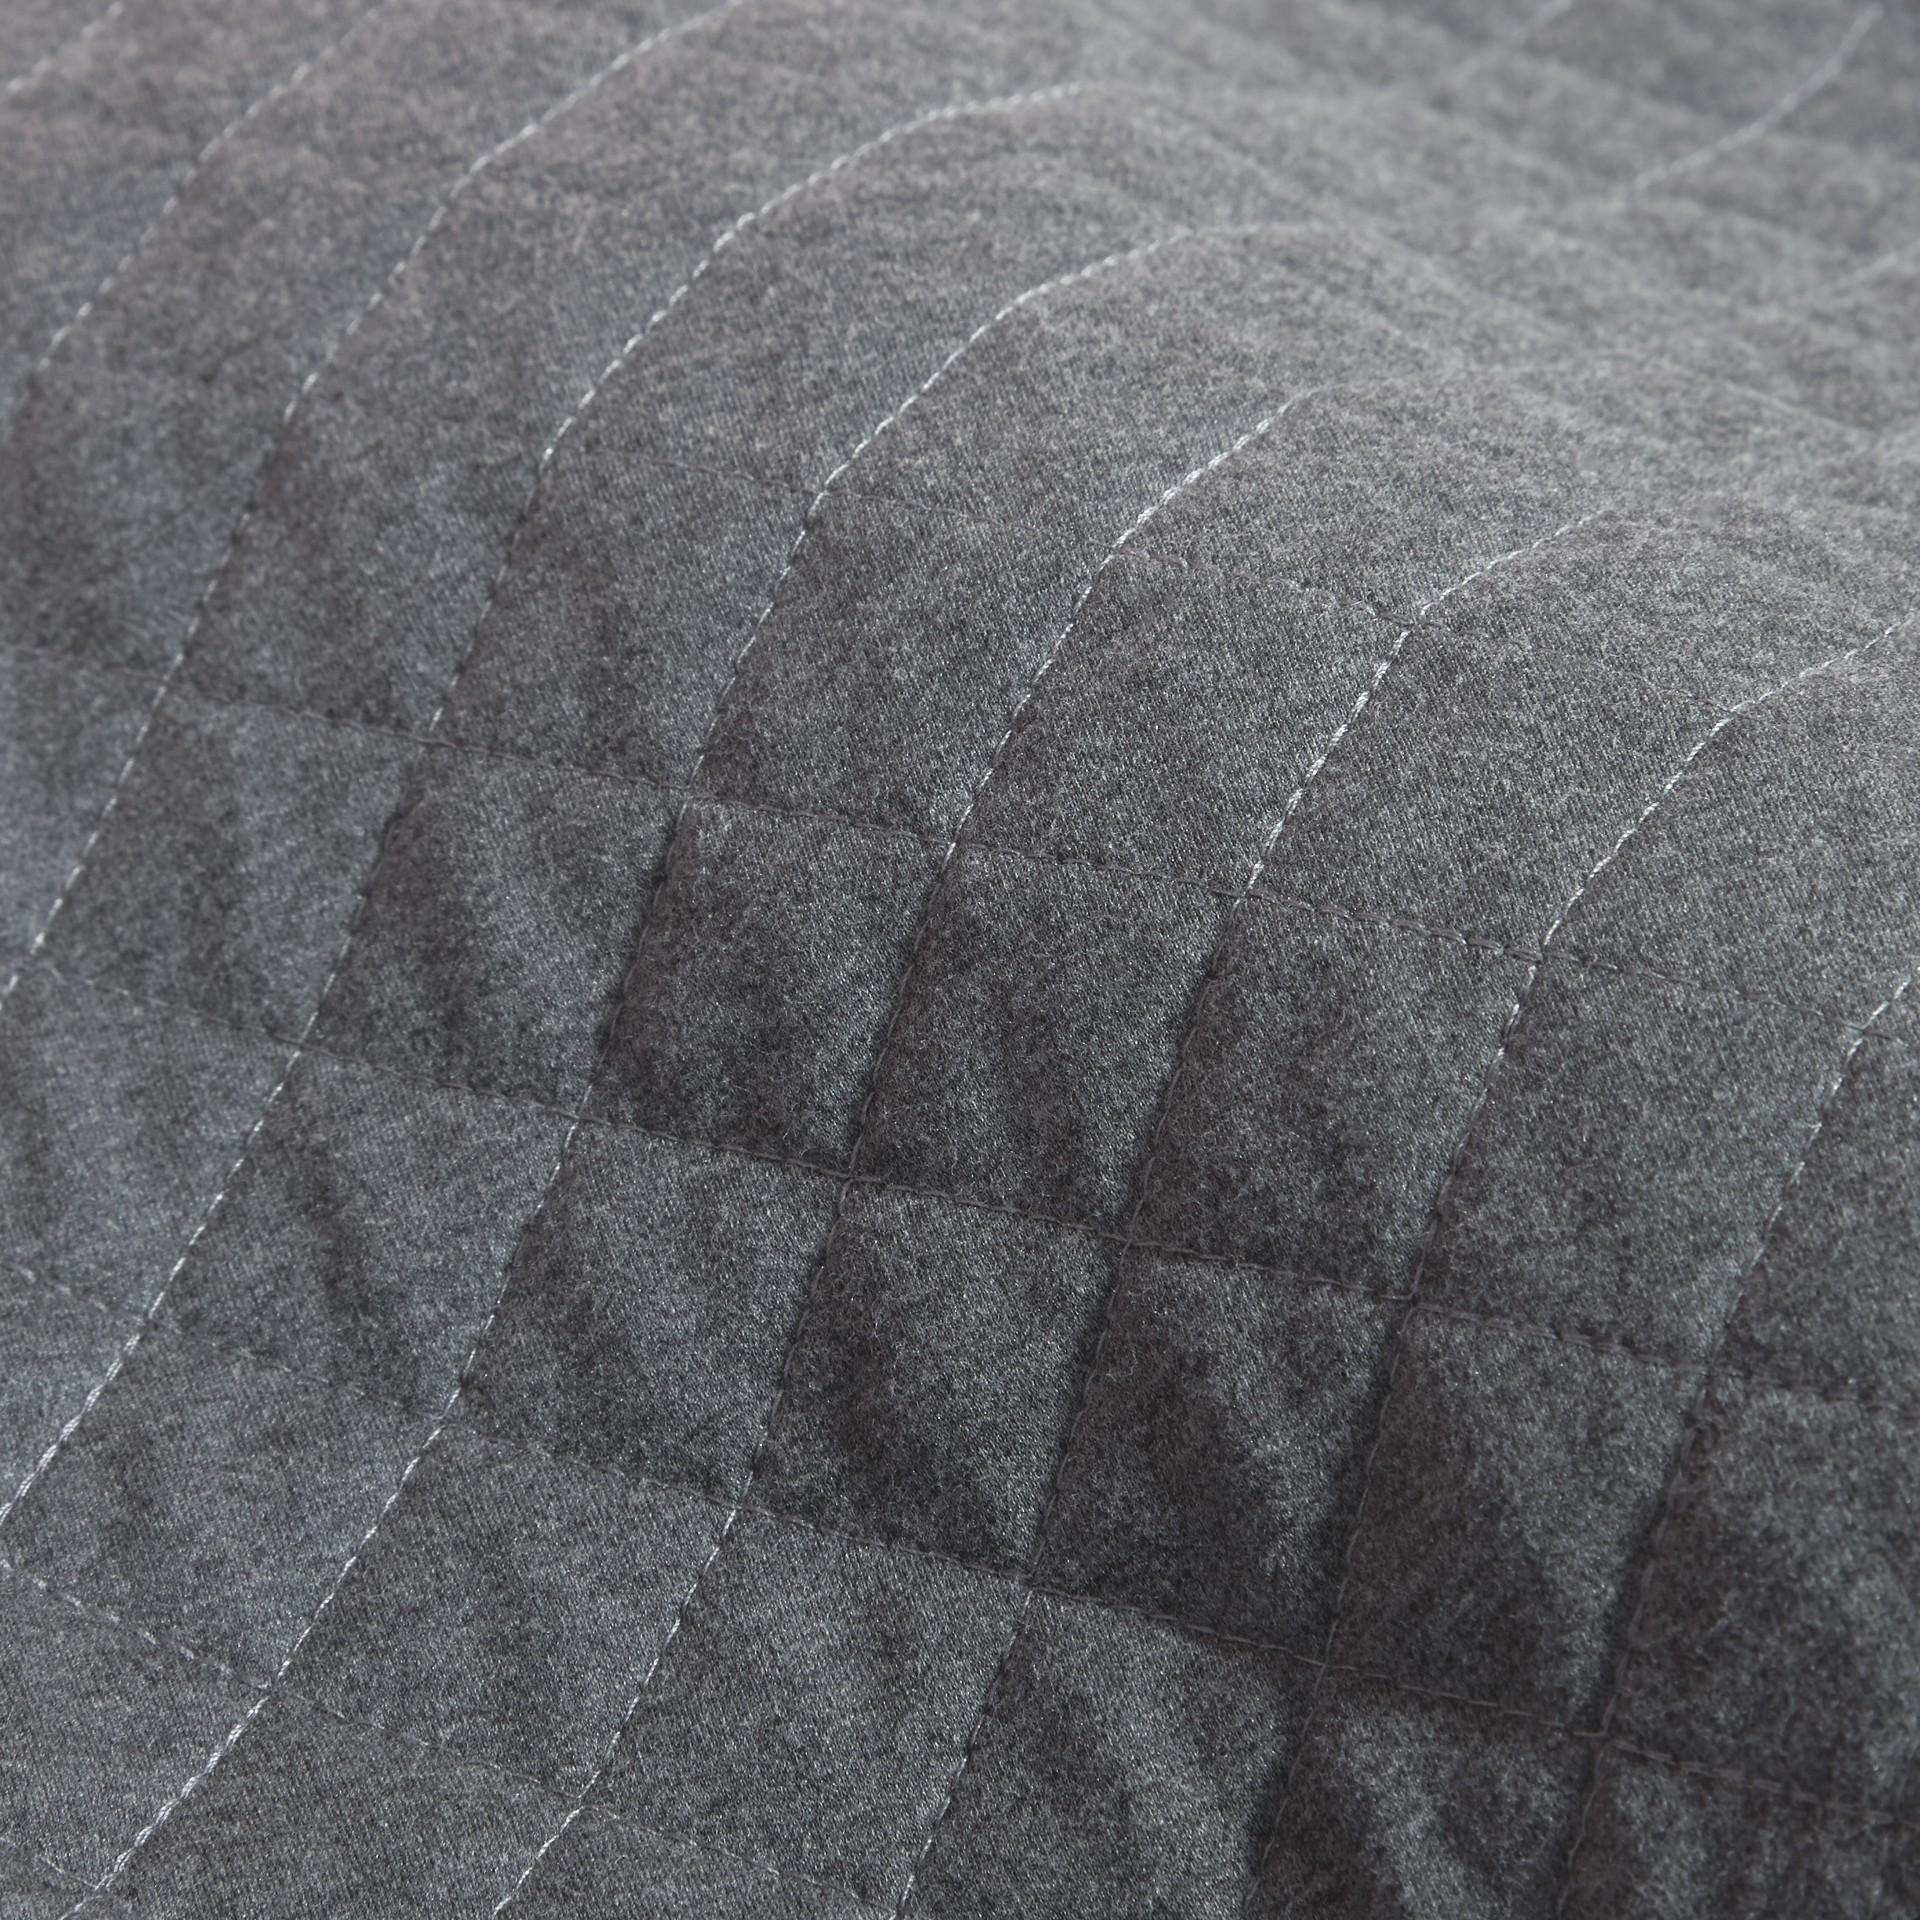 Dark grey melange Quilted Jersey and Check Cotton Day Dress Dark Grey Melange - gallery image 2